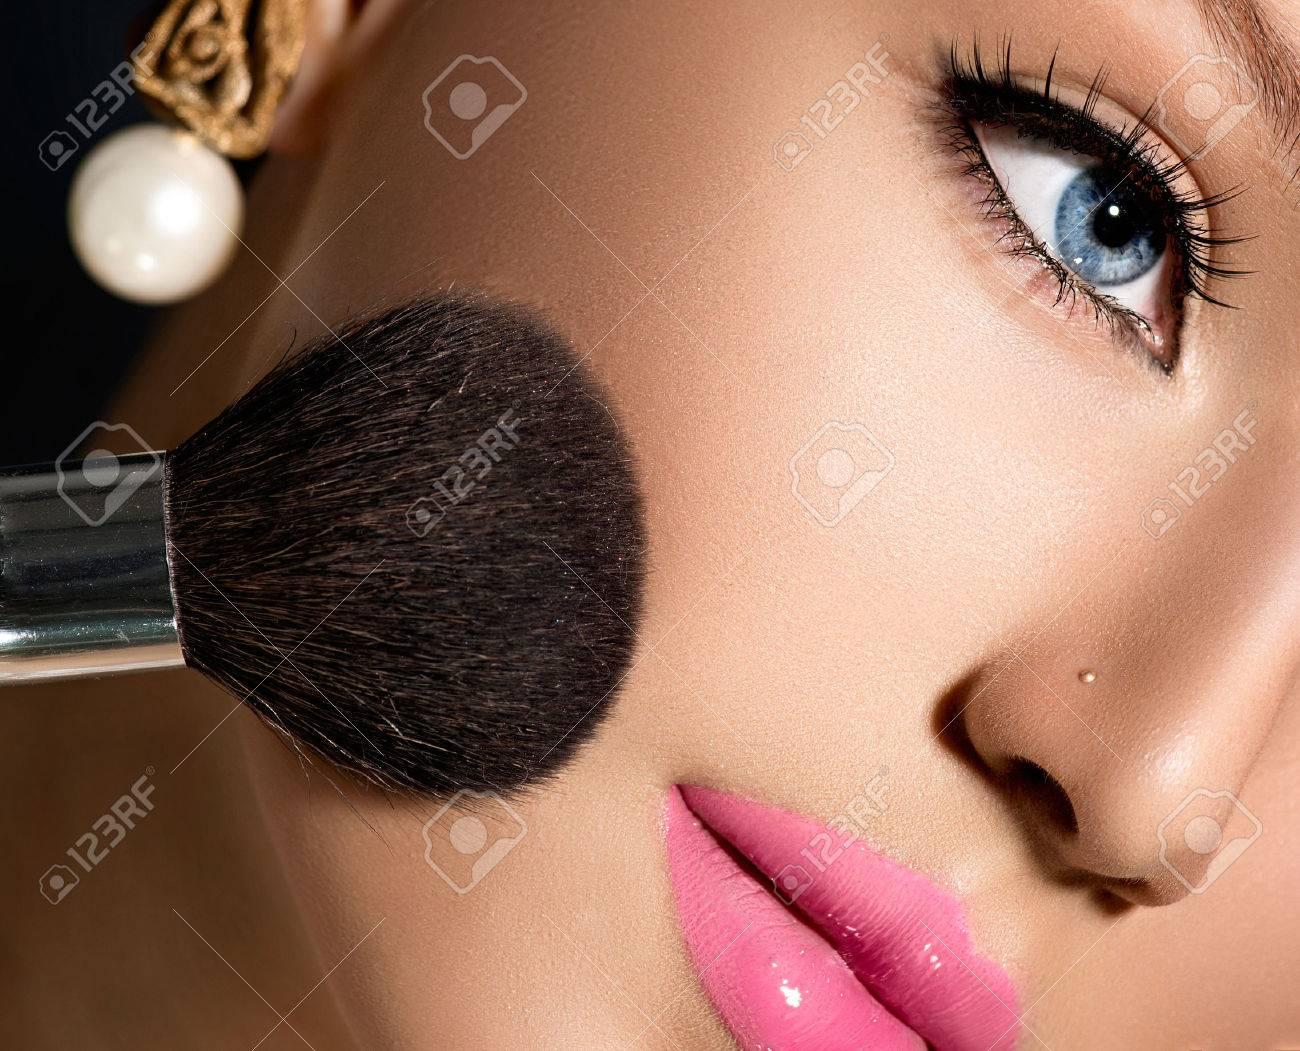 Make-up Applying closeup Cosmetic Powder Brush for Makeup - 27686938